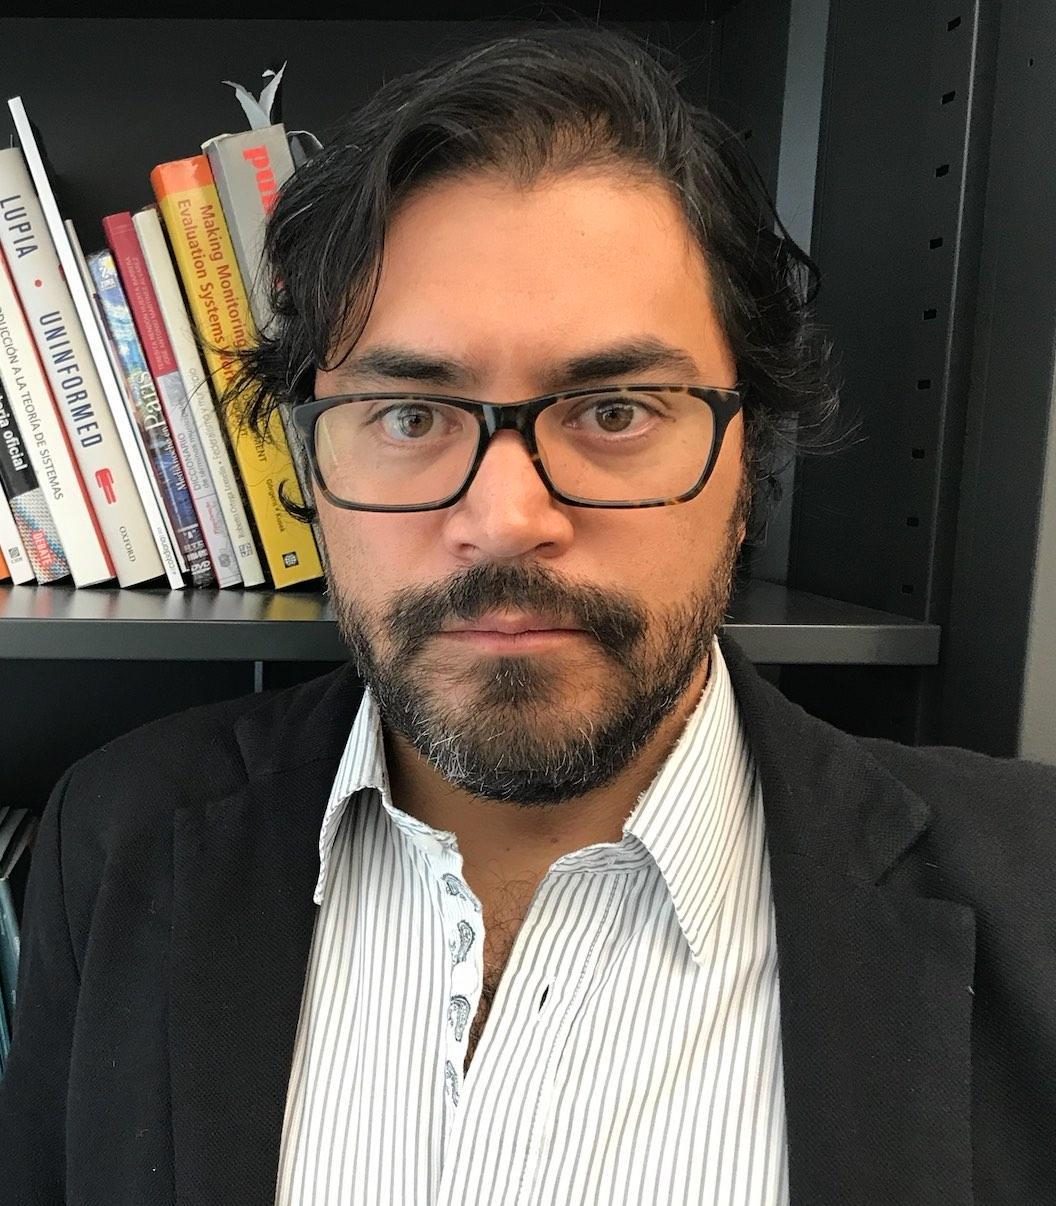 Oliver Meza